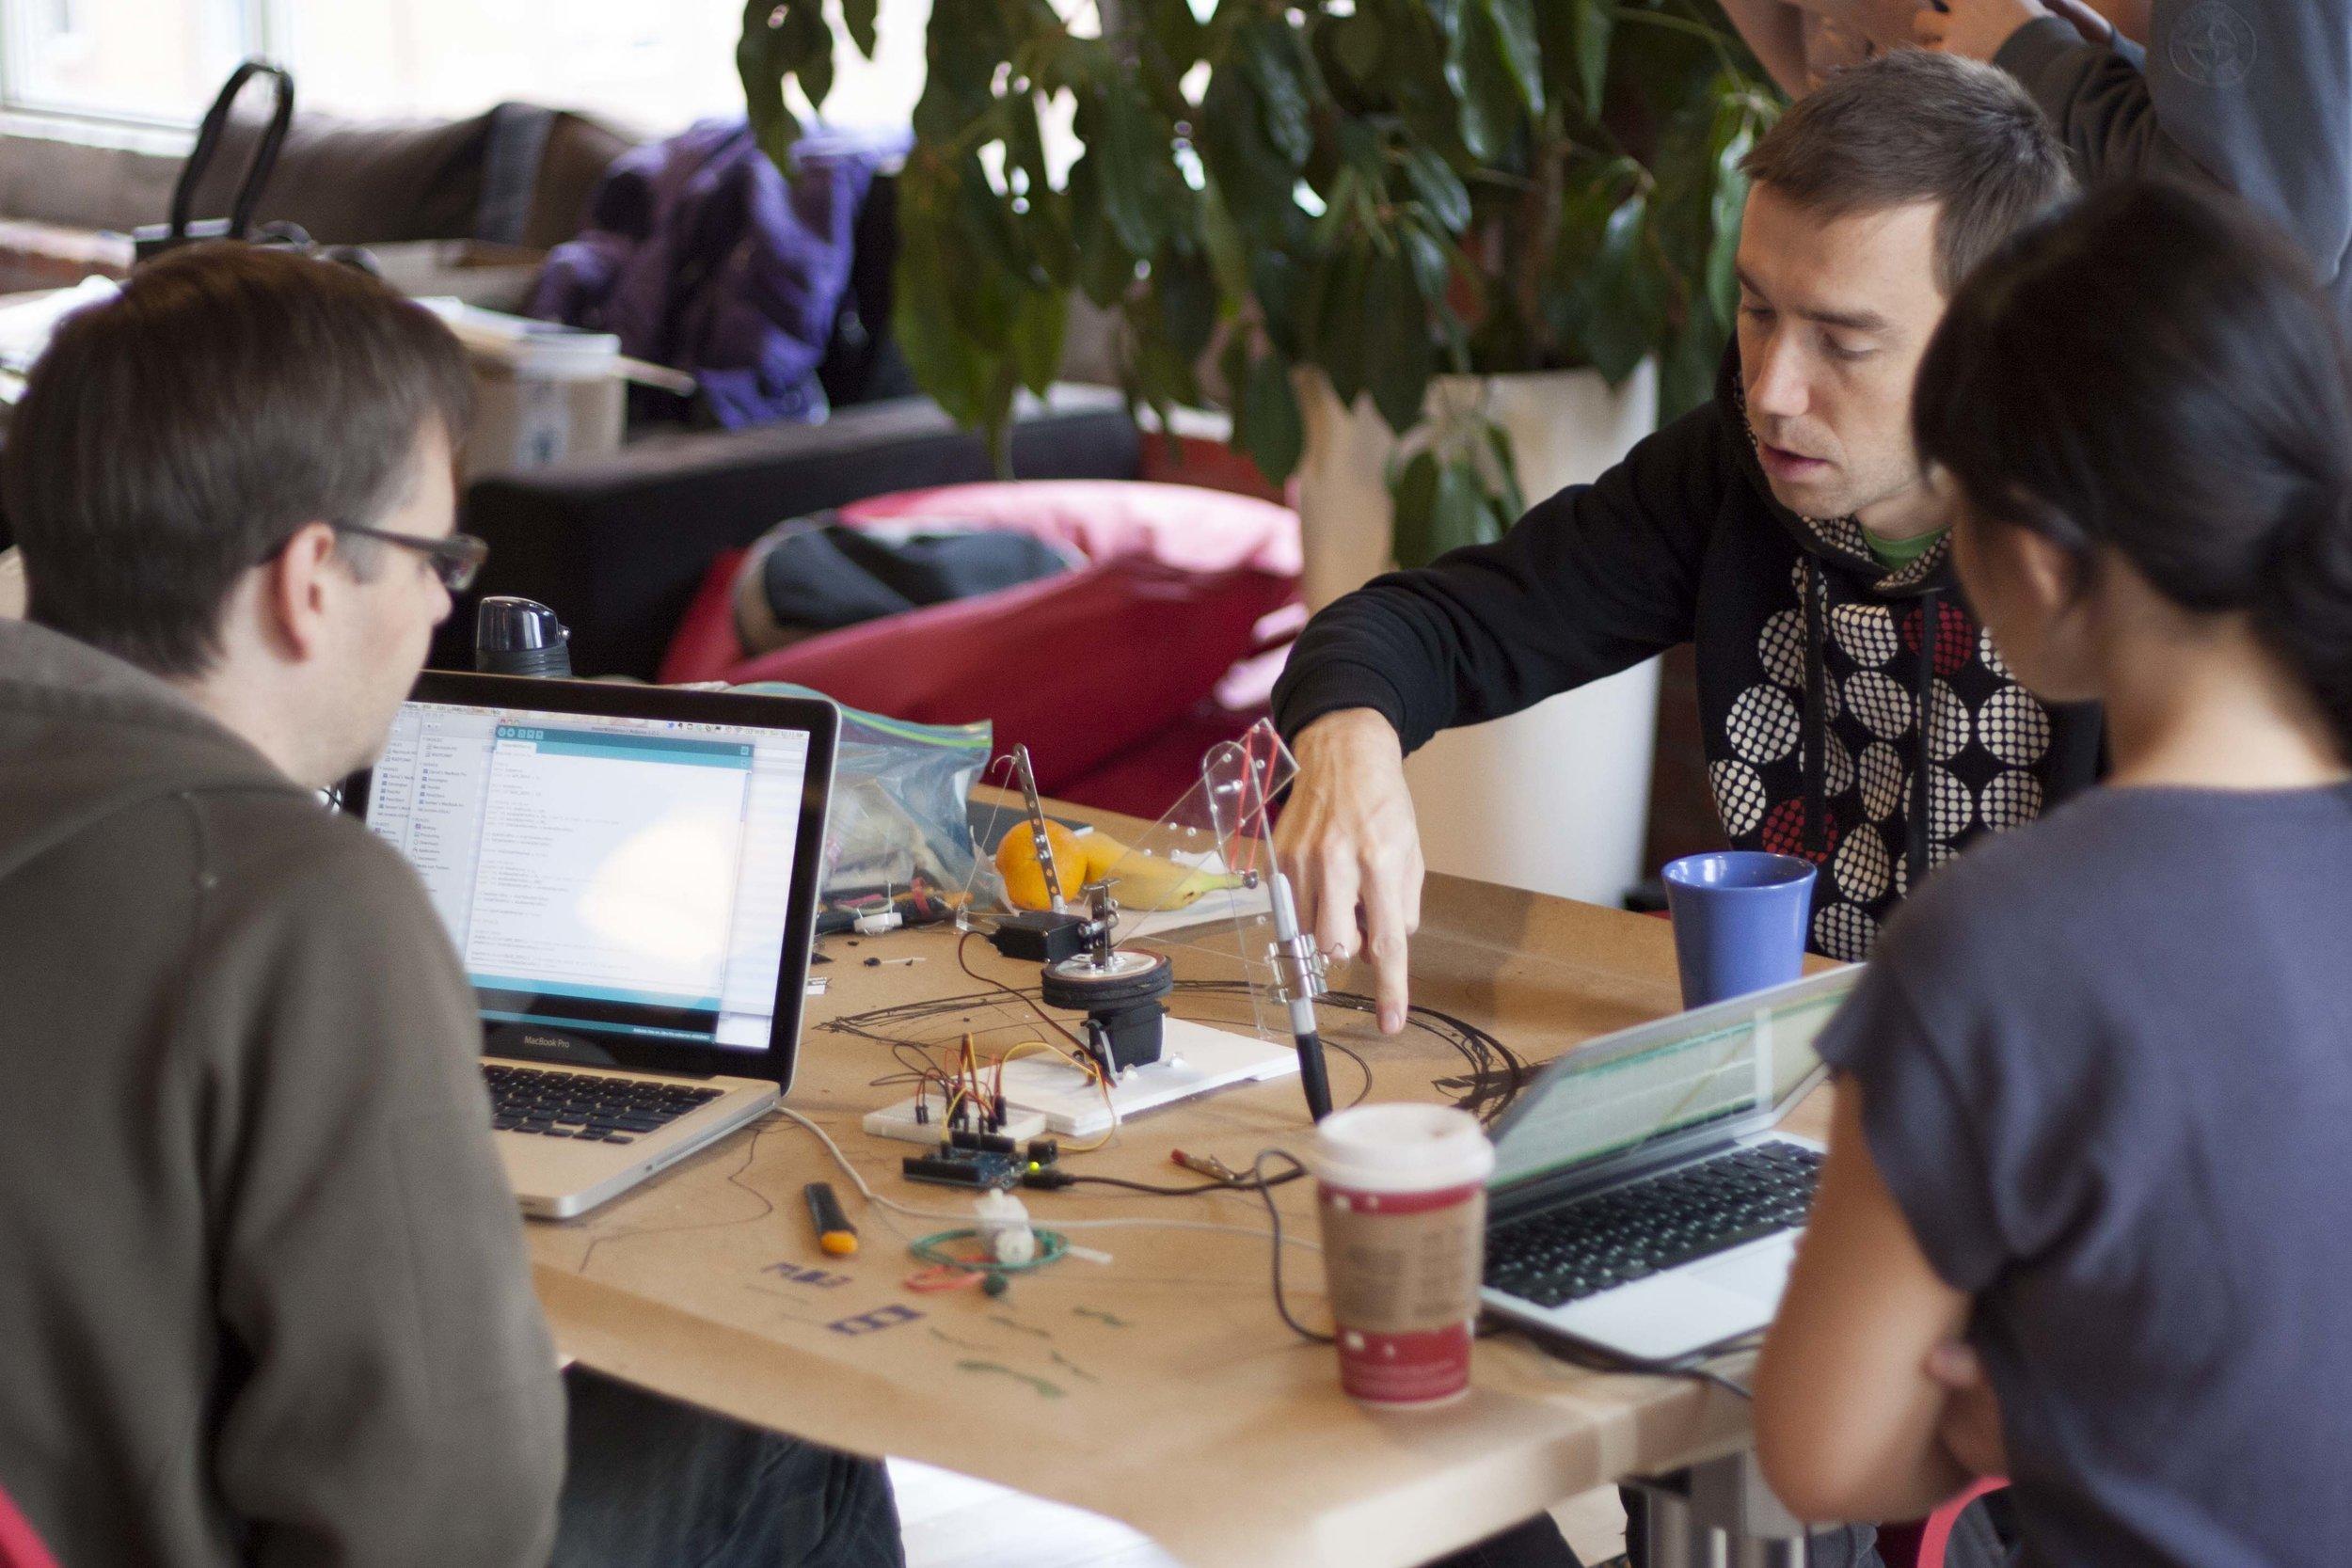 Mr. Moboto at the 2012 Get Your Bot On! Robotics Hackathon